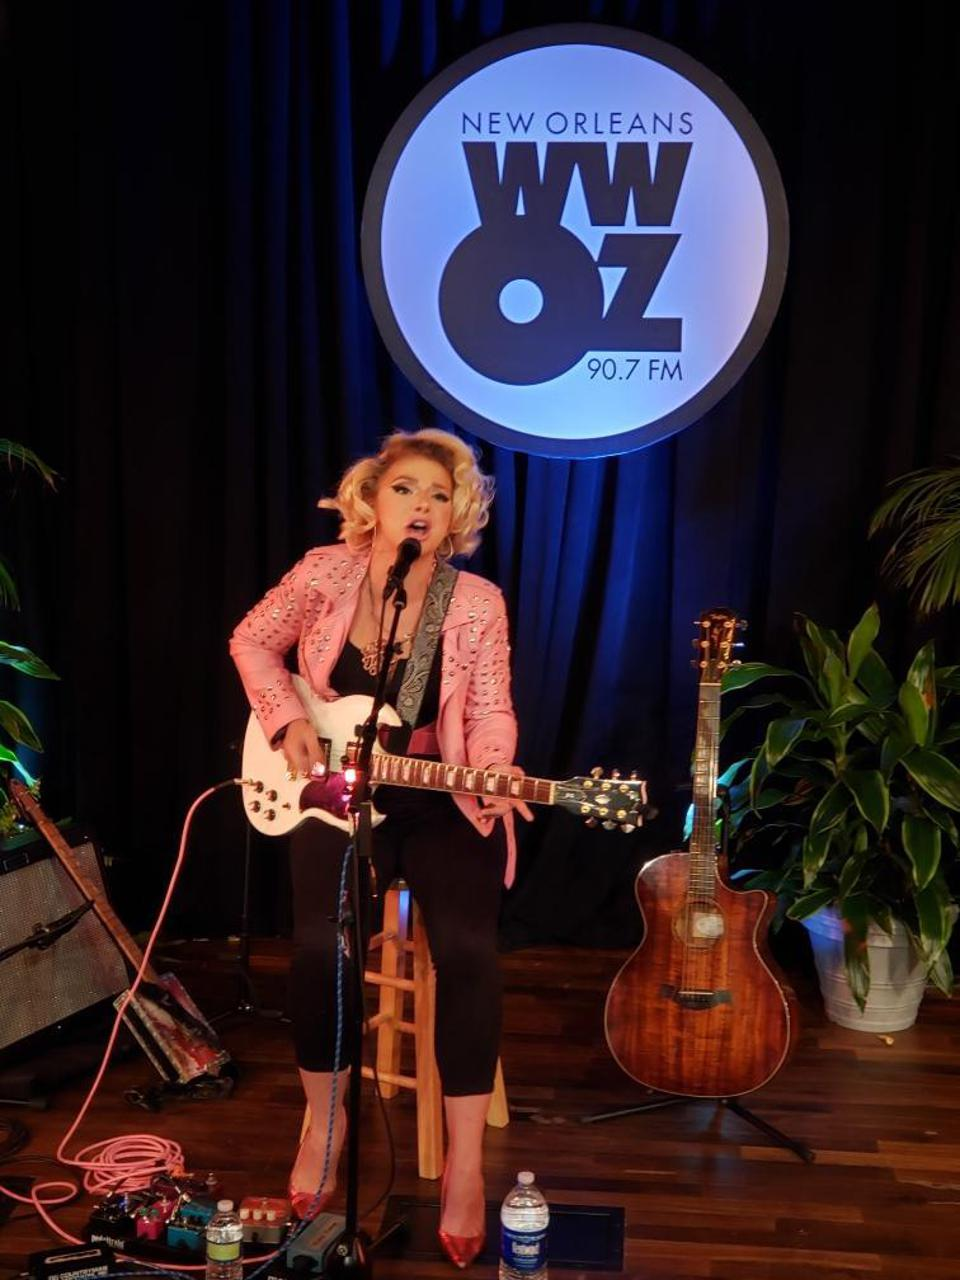 Samantha Fish on stage